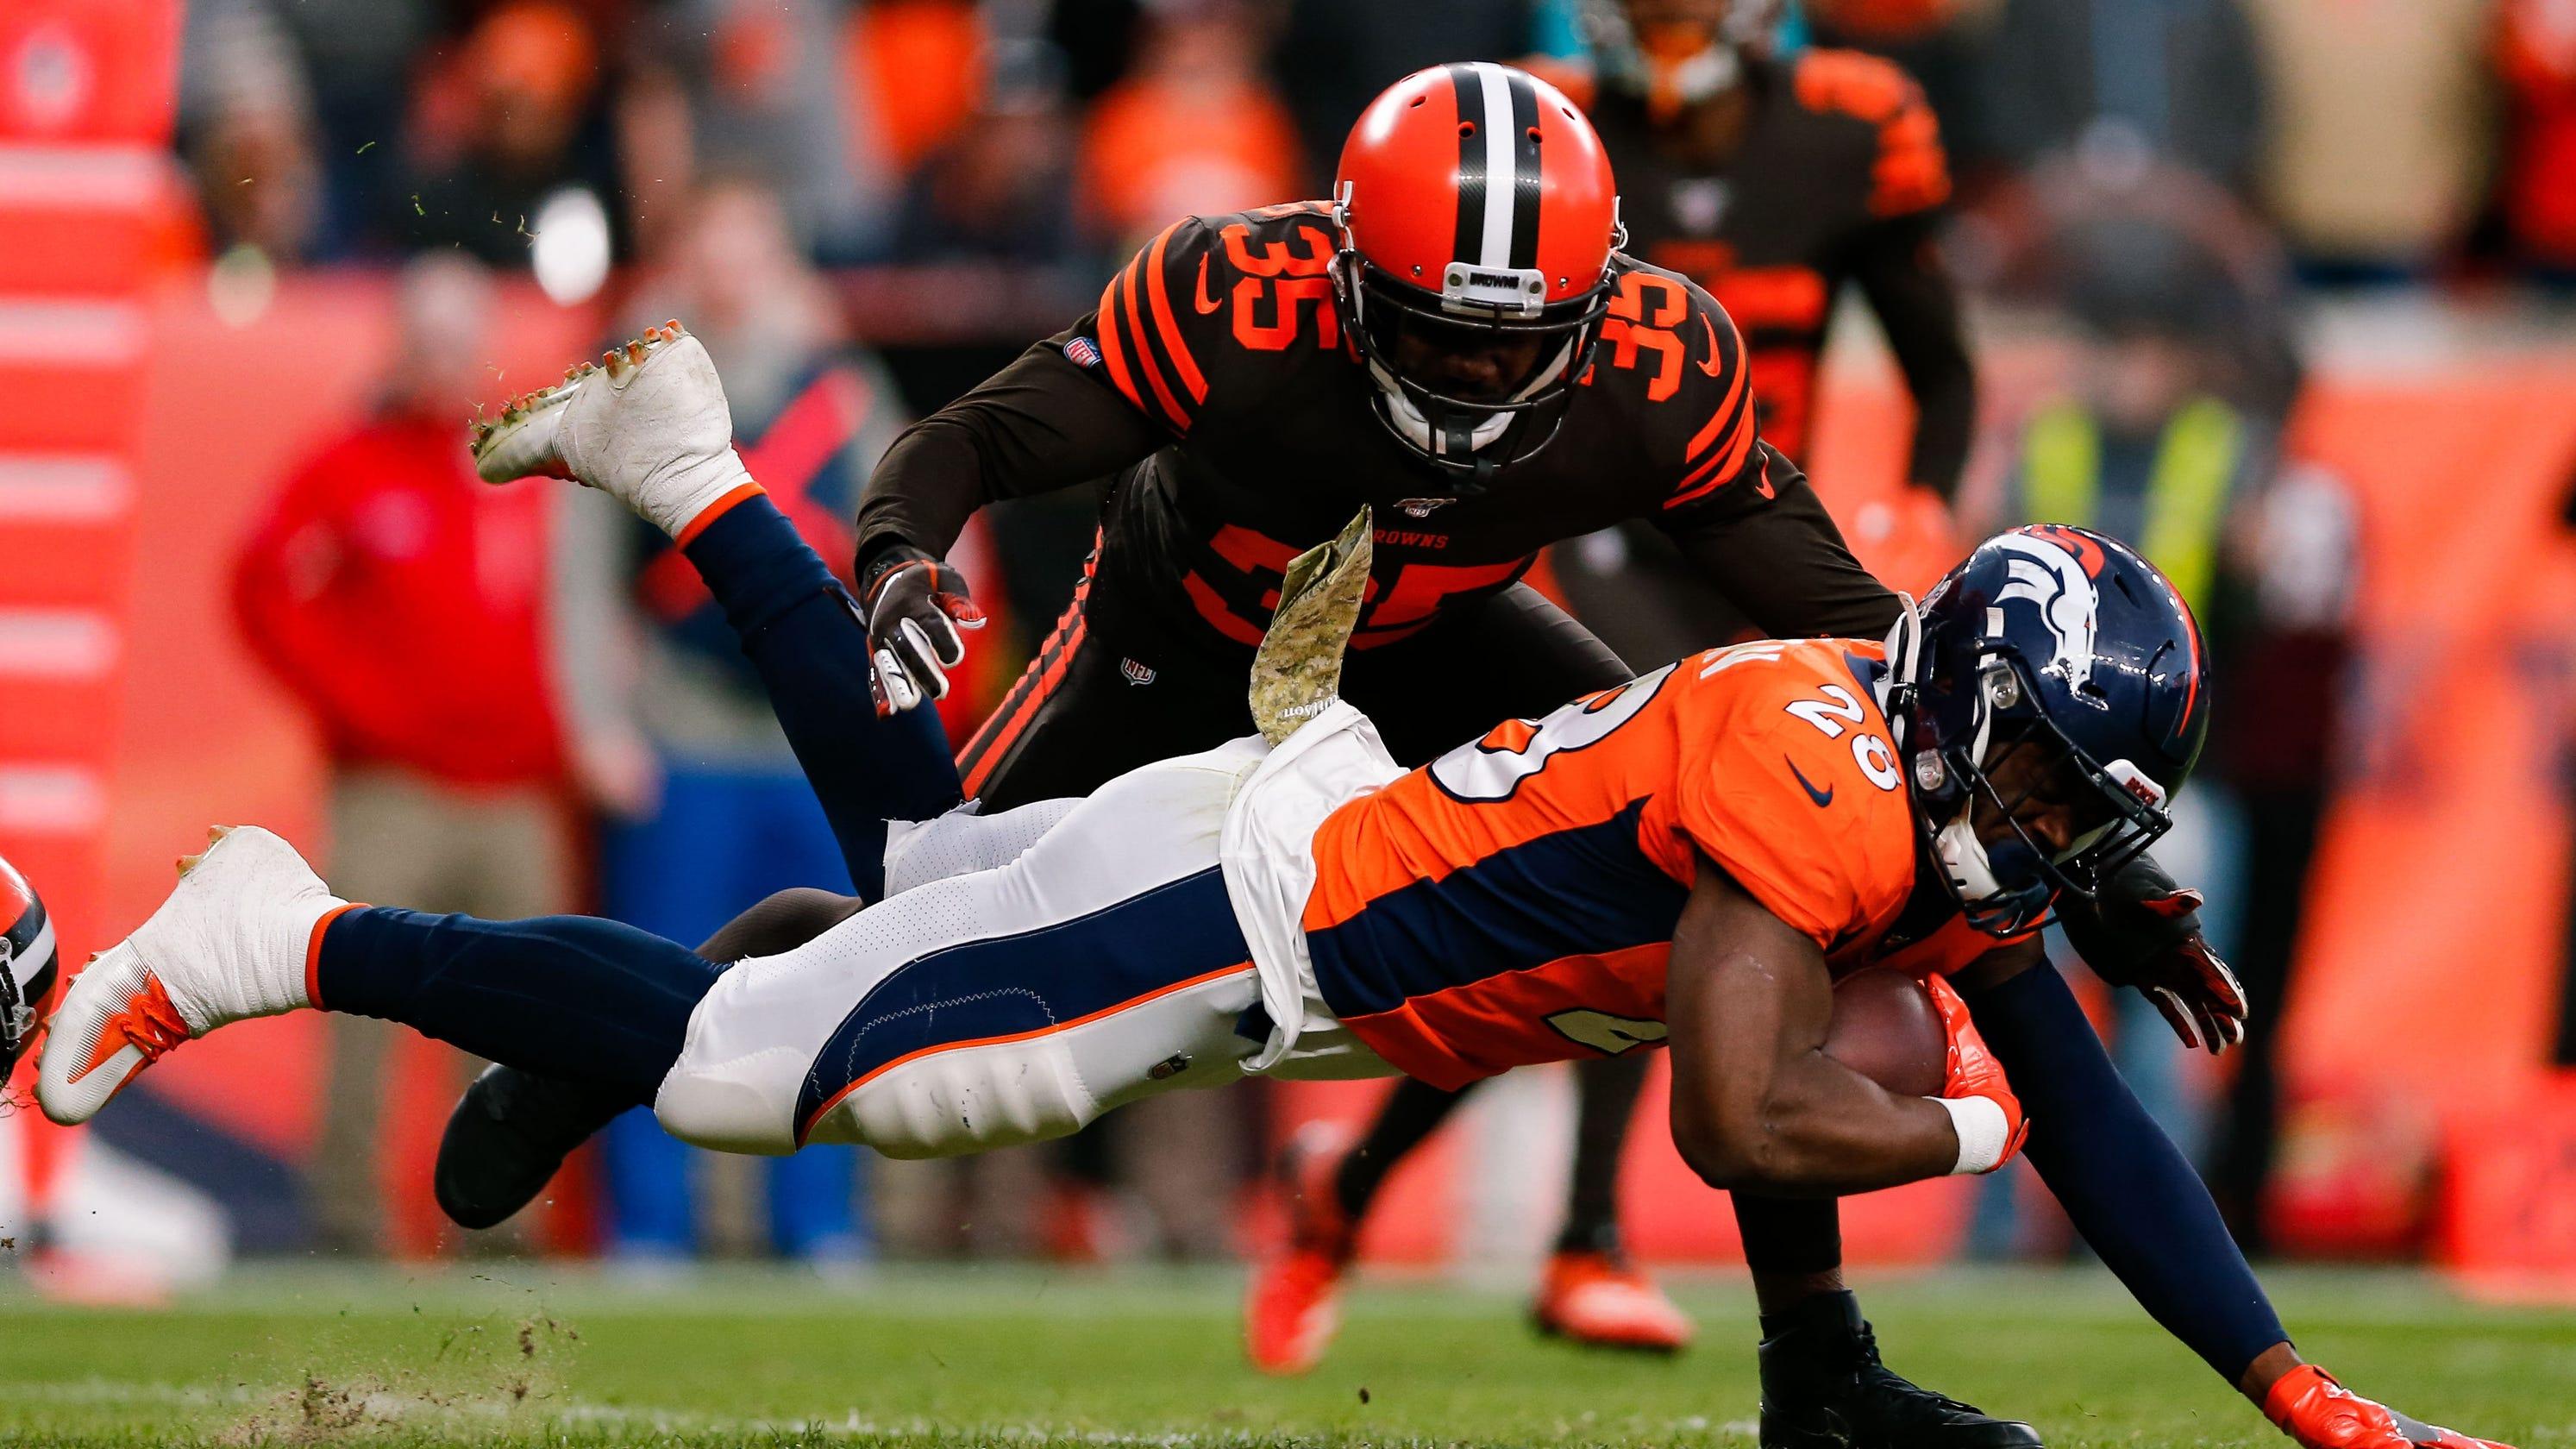 Browns' Jermaine Whitehead threatens critics on Twitter, team calls tweets 'unacceptable'